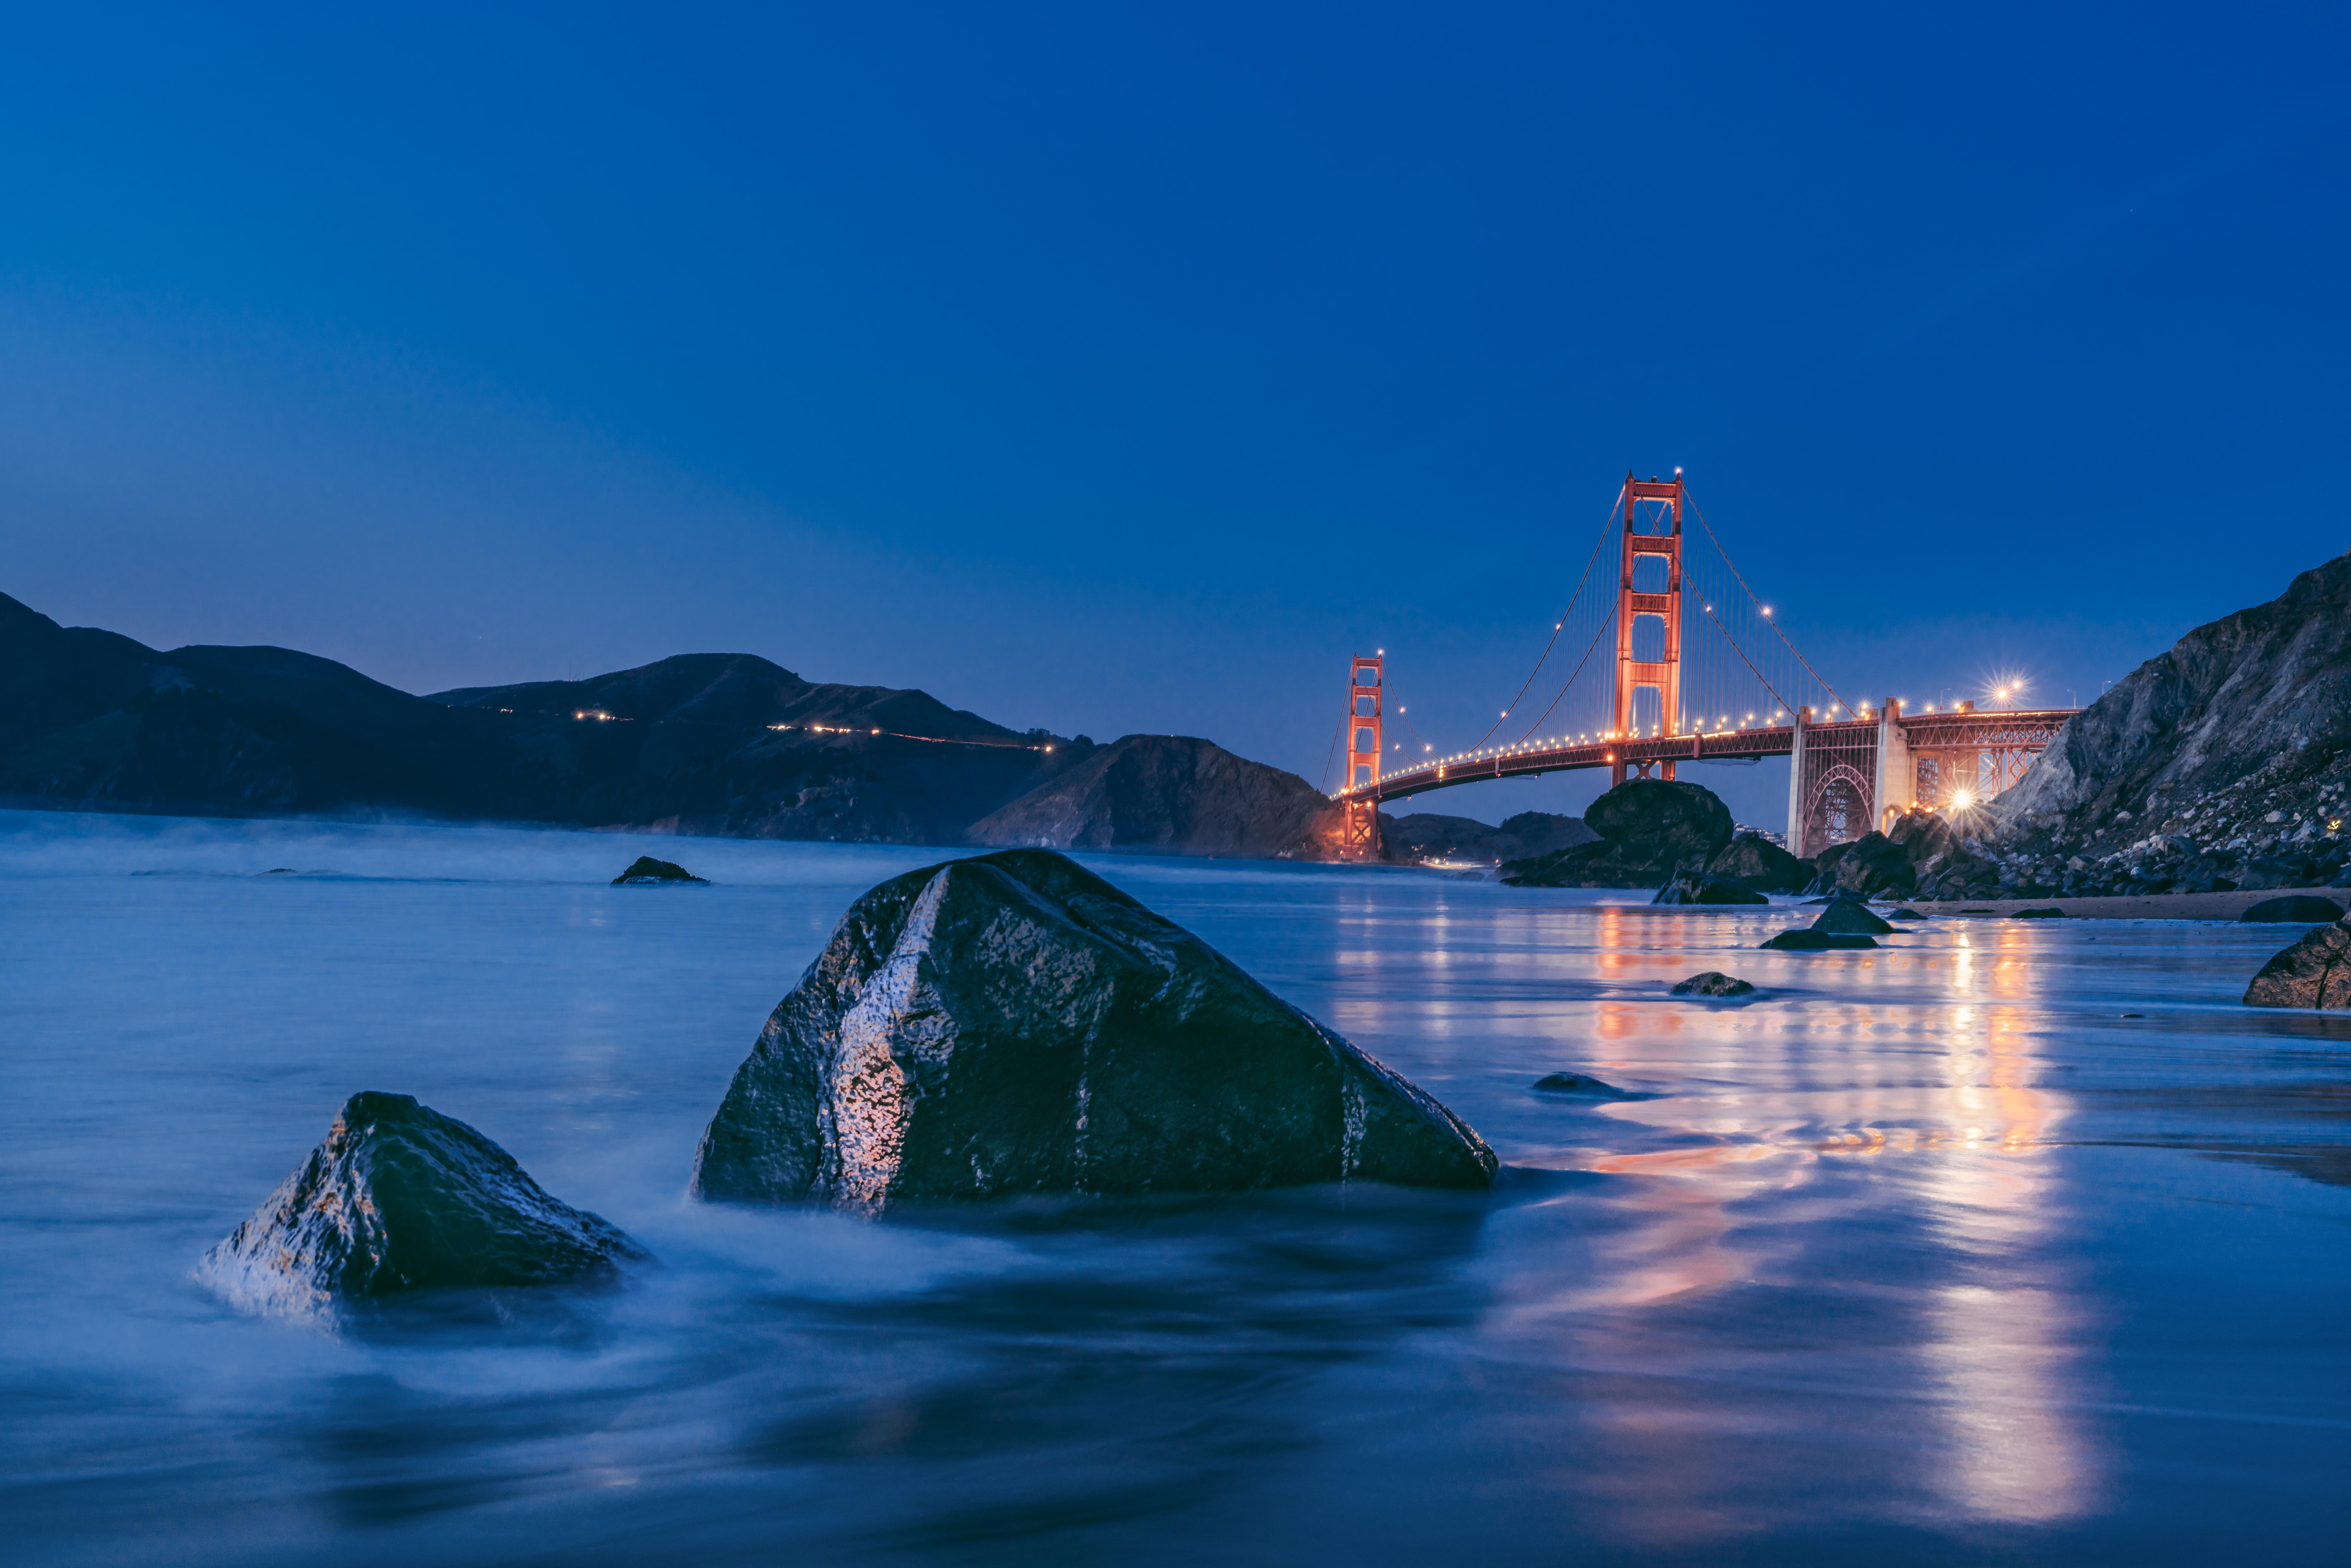 Golden gate bridge sunset 8k hd nature 4k wallpapers - Wallpapers 1280x800 nature ...